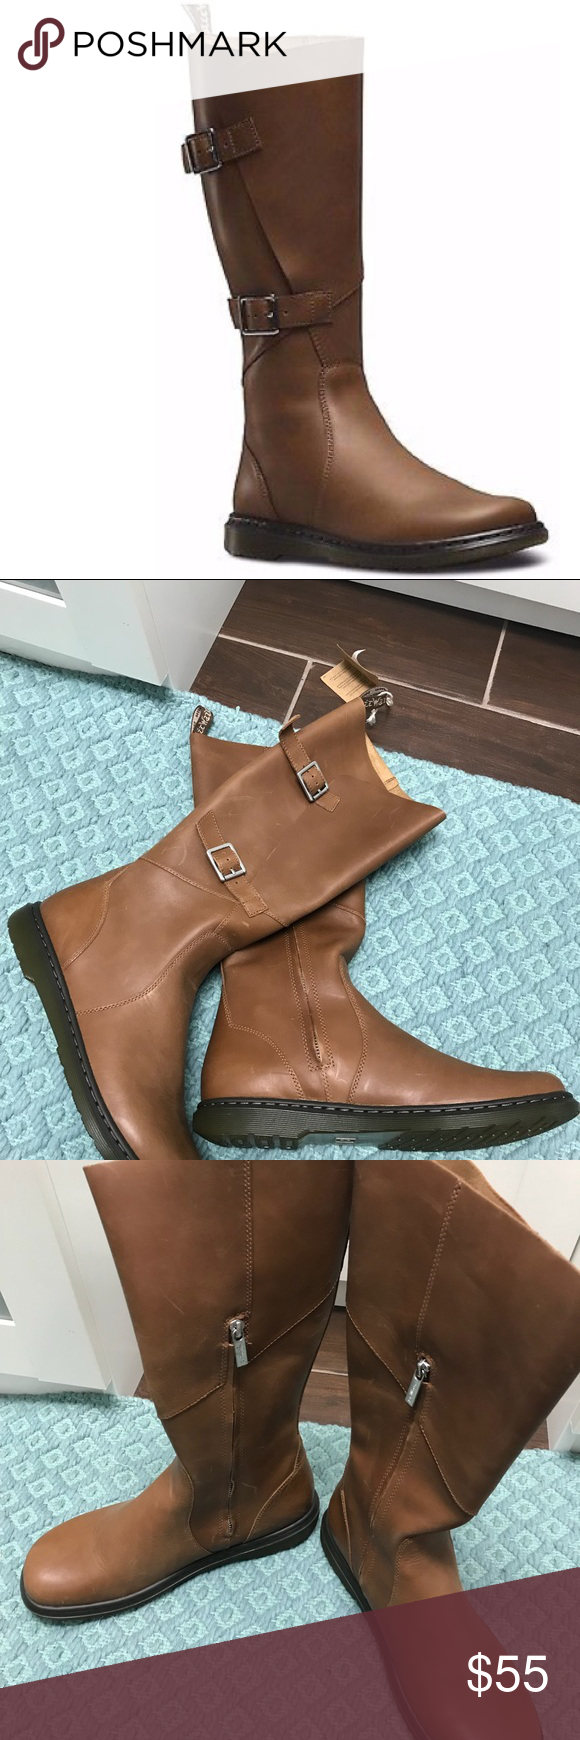 Dr. Martens Caite boots new   Boots